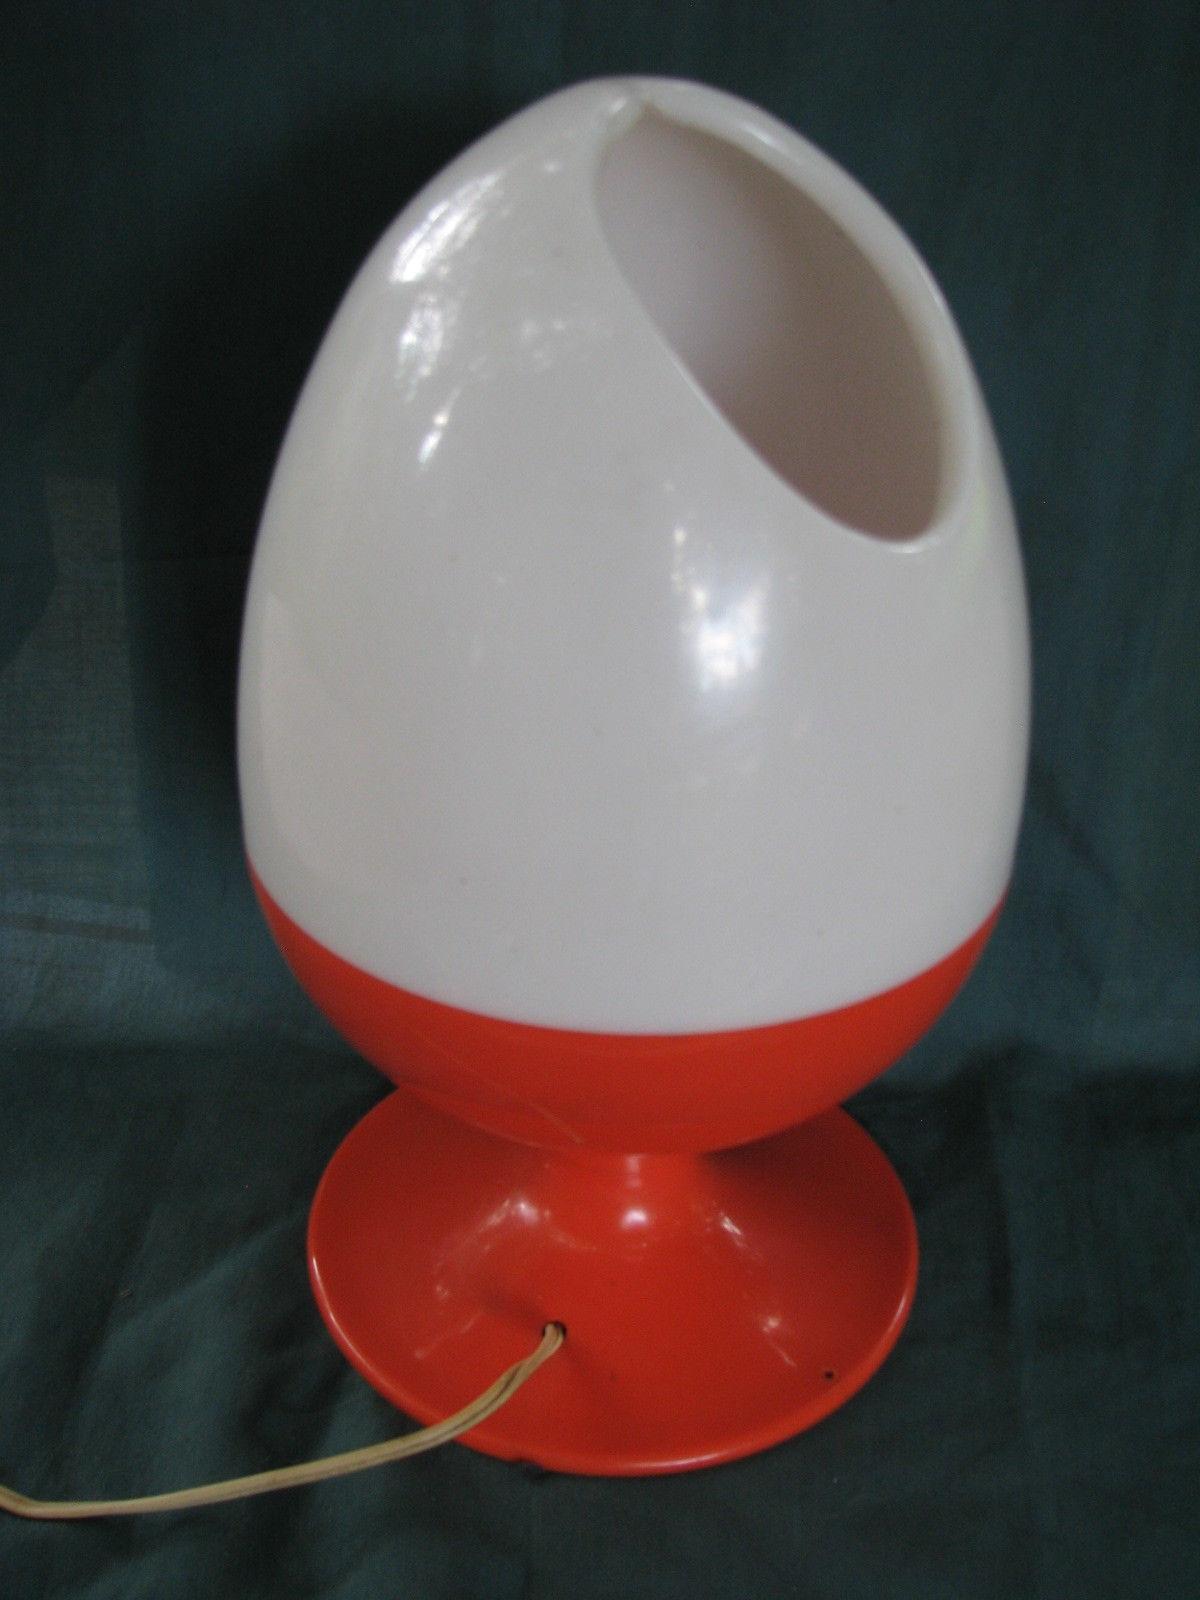 Vintage Mid-Century Modern Plastic Egg Table Lamp ,c.n Burman,orange pertaining to Mid-Century Modern Egg Tables (Image 25 of 30)